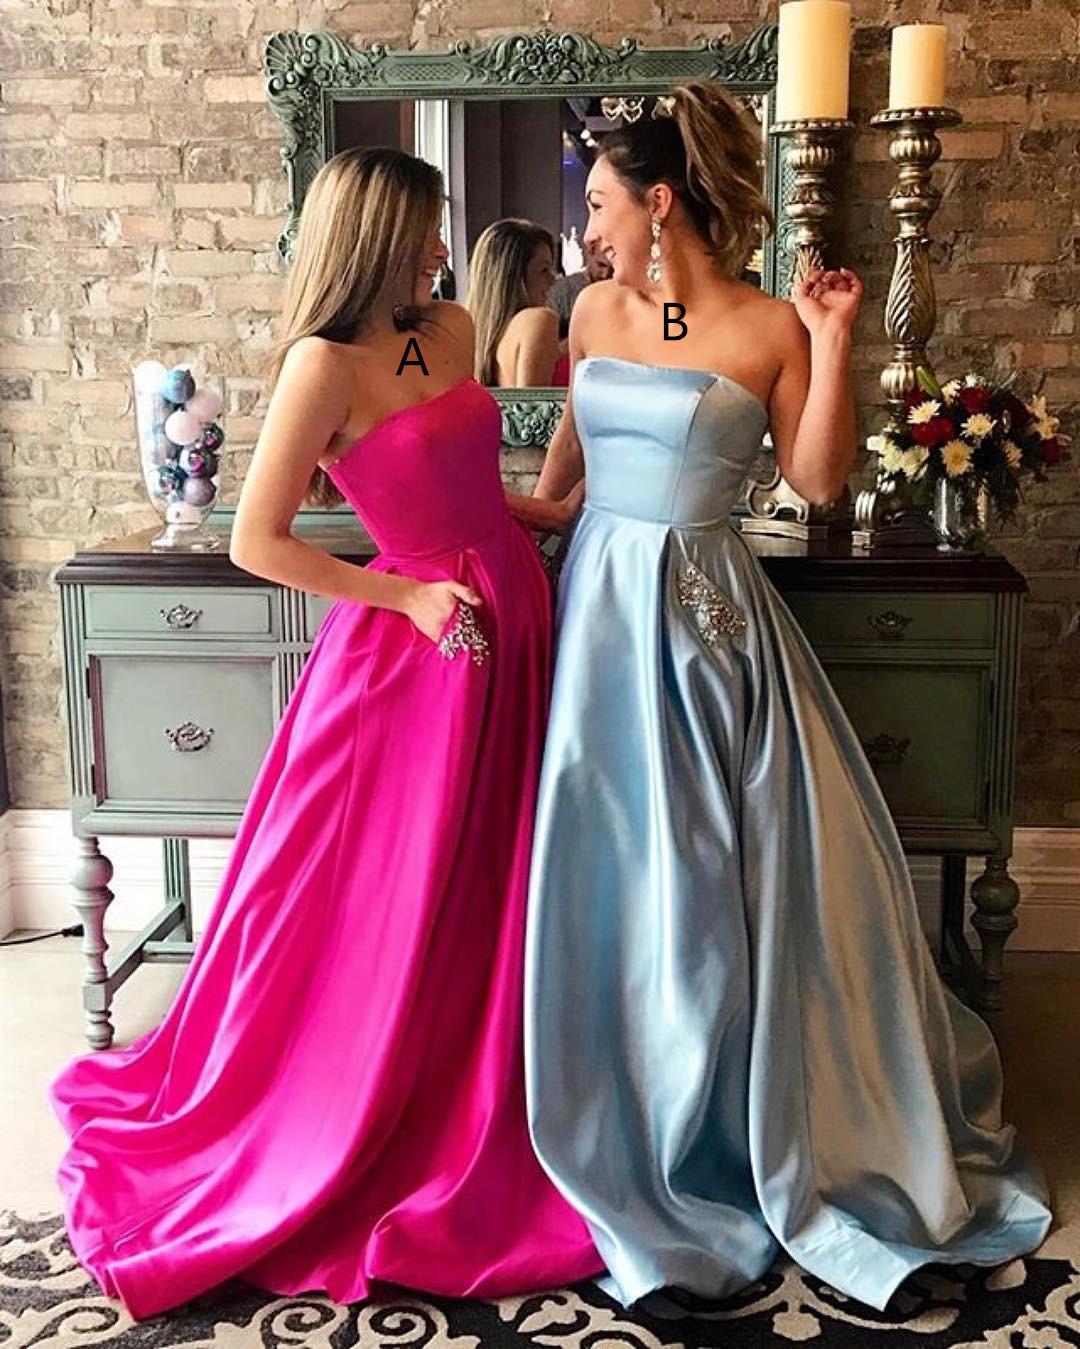 2017 Long Prom Dress Light Prom Dress Hot Pink Prom DressStrapless Prom Dress  modsele